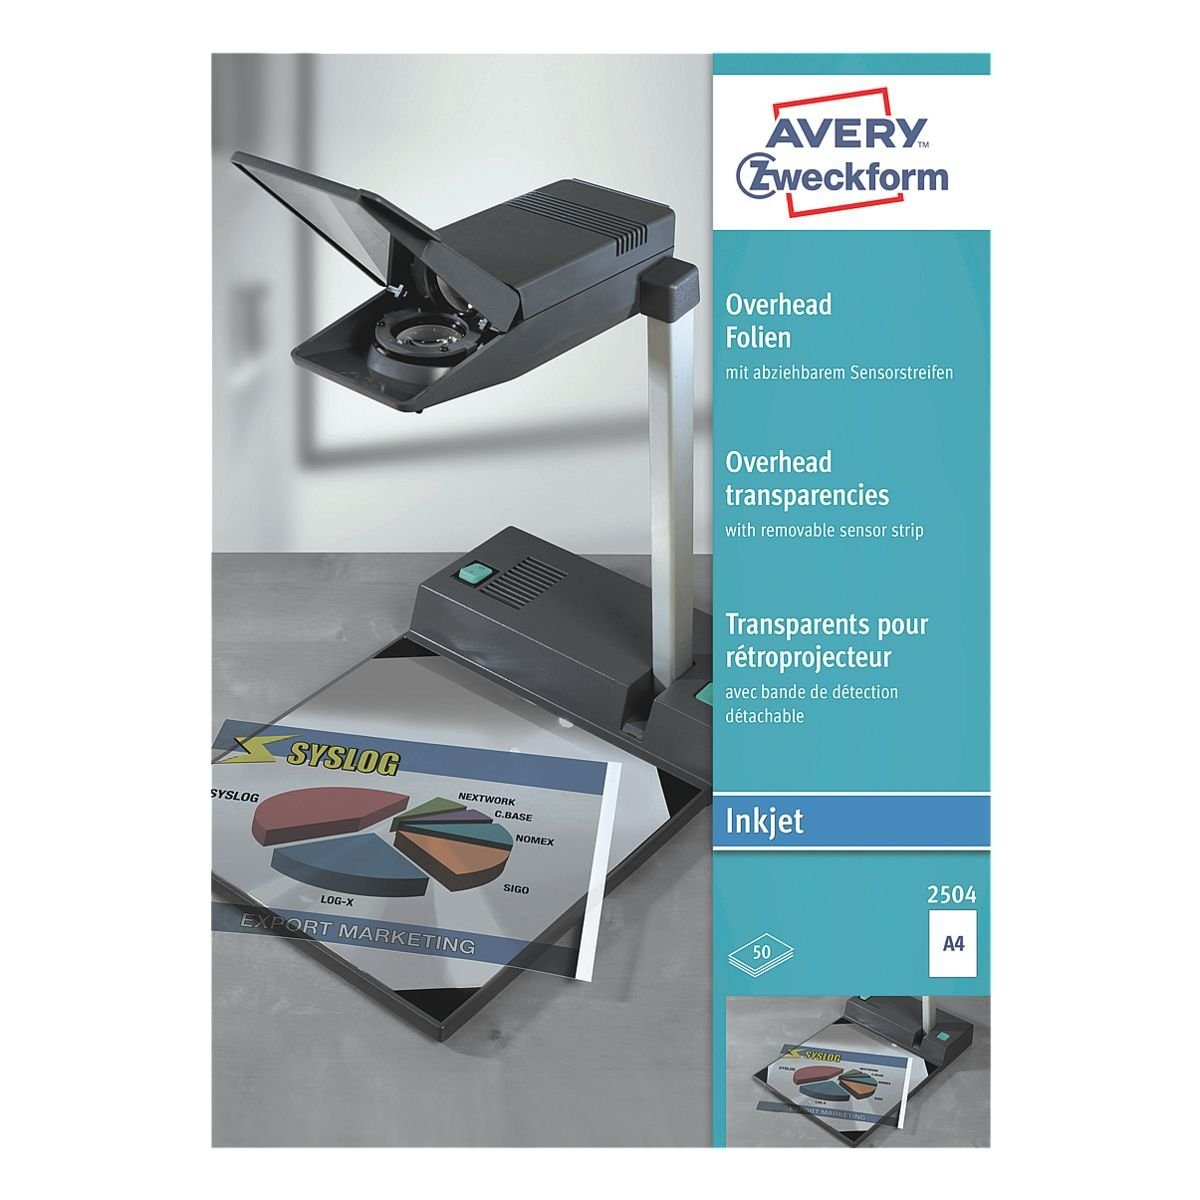 Avery Zweckform Overhead-Folien